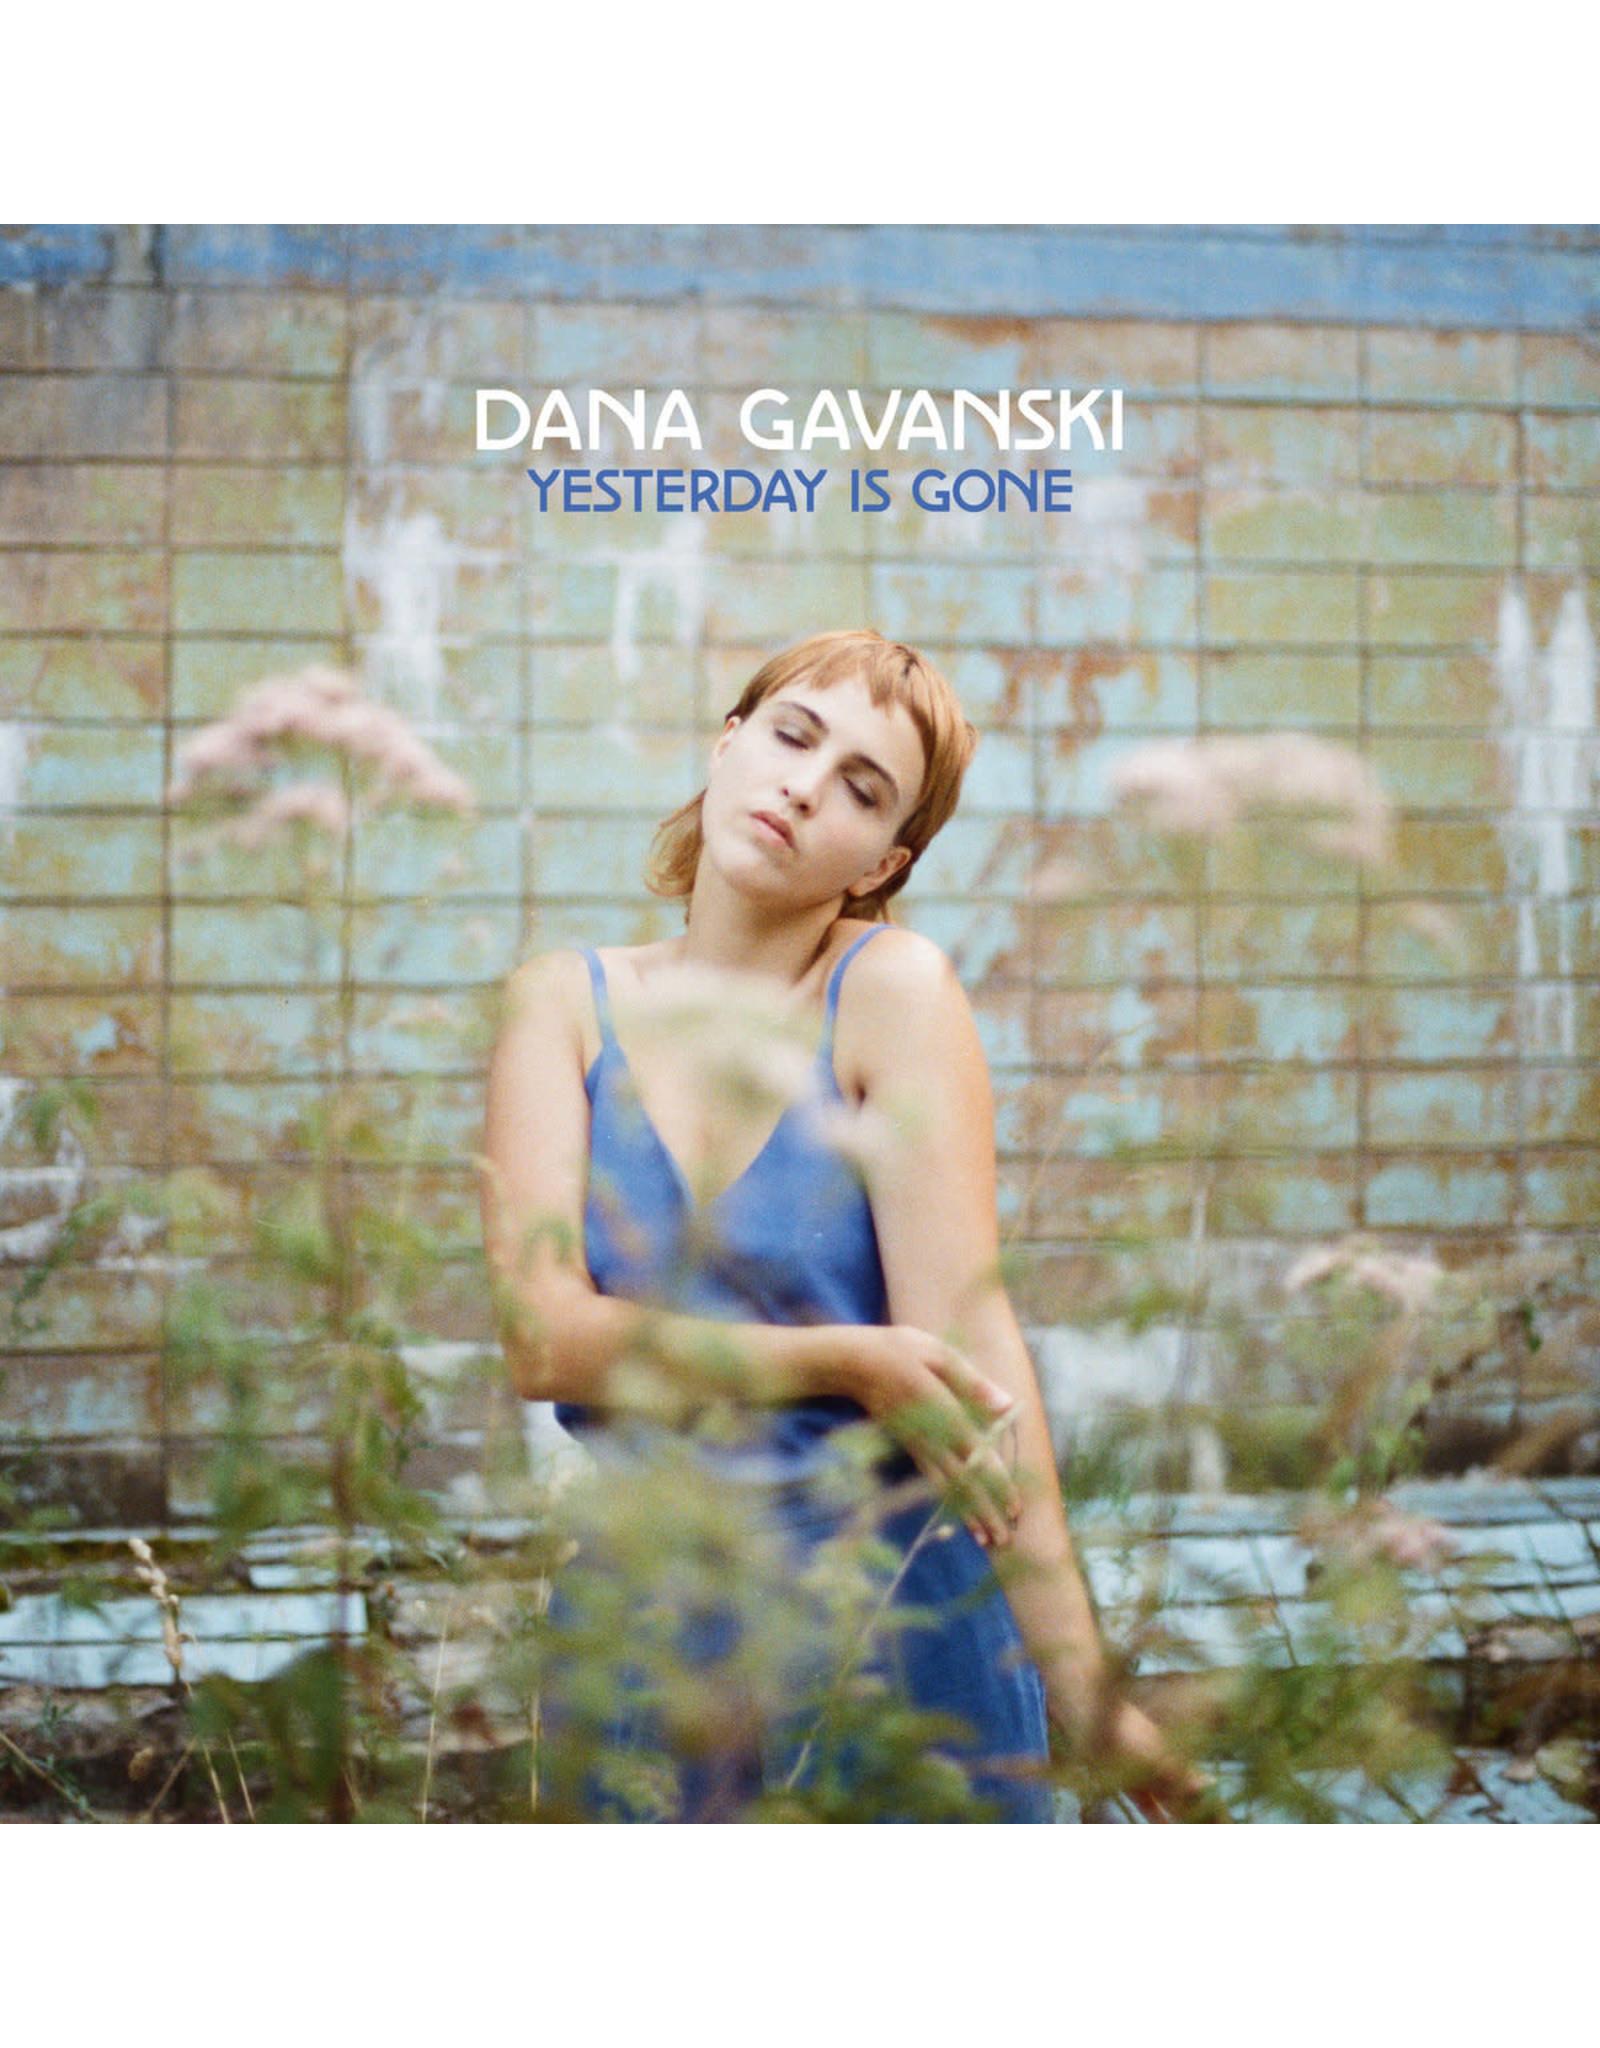 Gavanski, Dana - Yesterday Is Gone LP